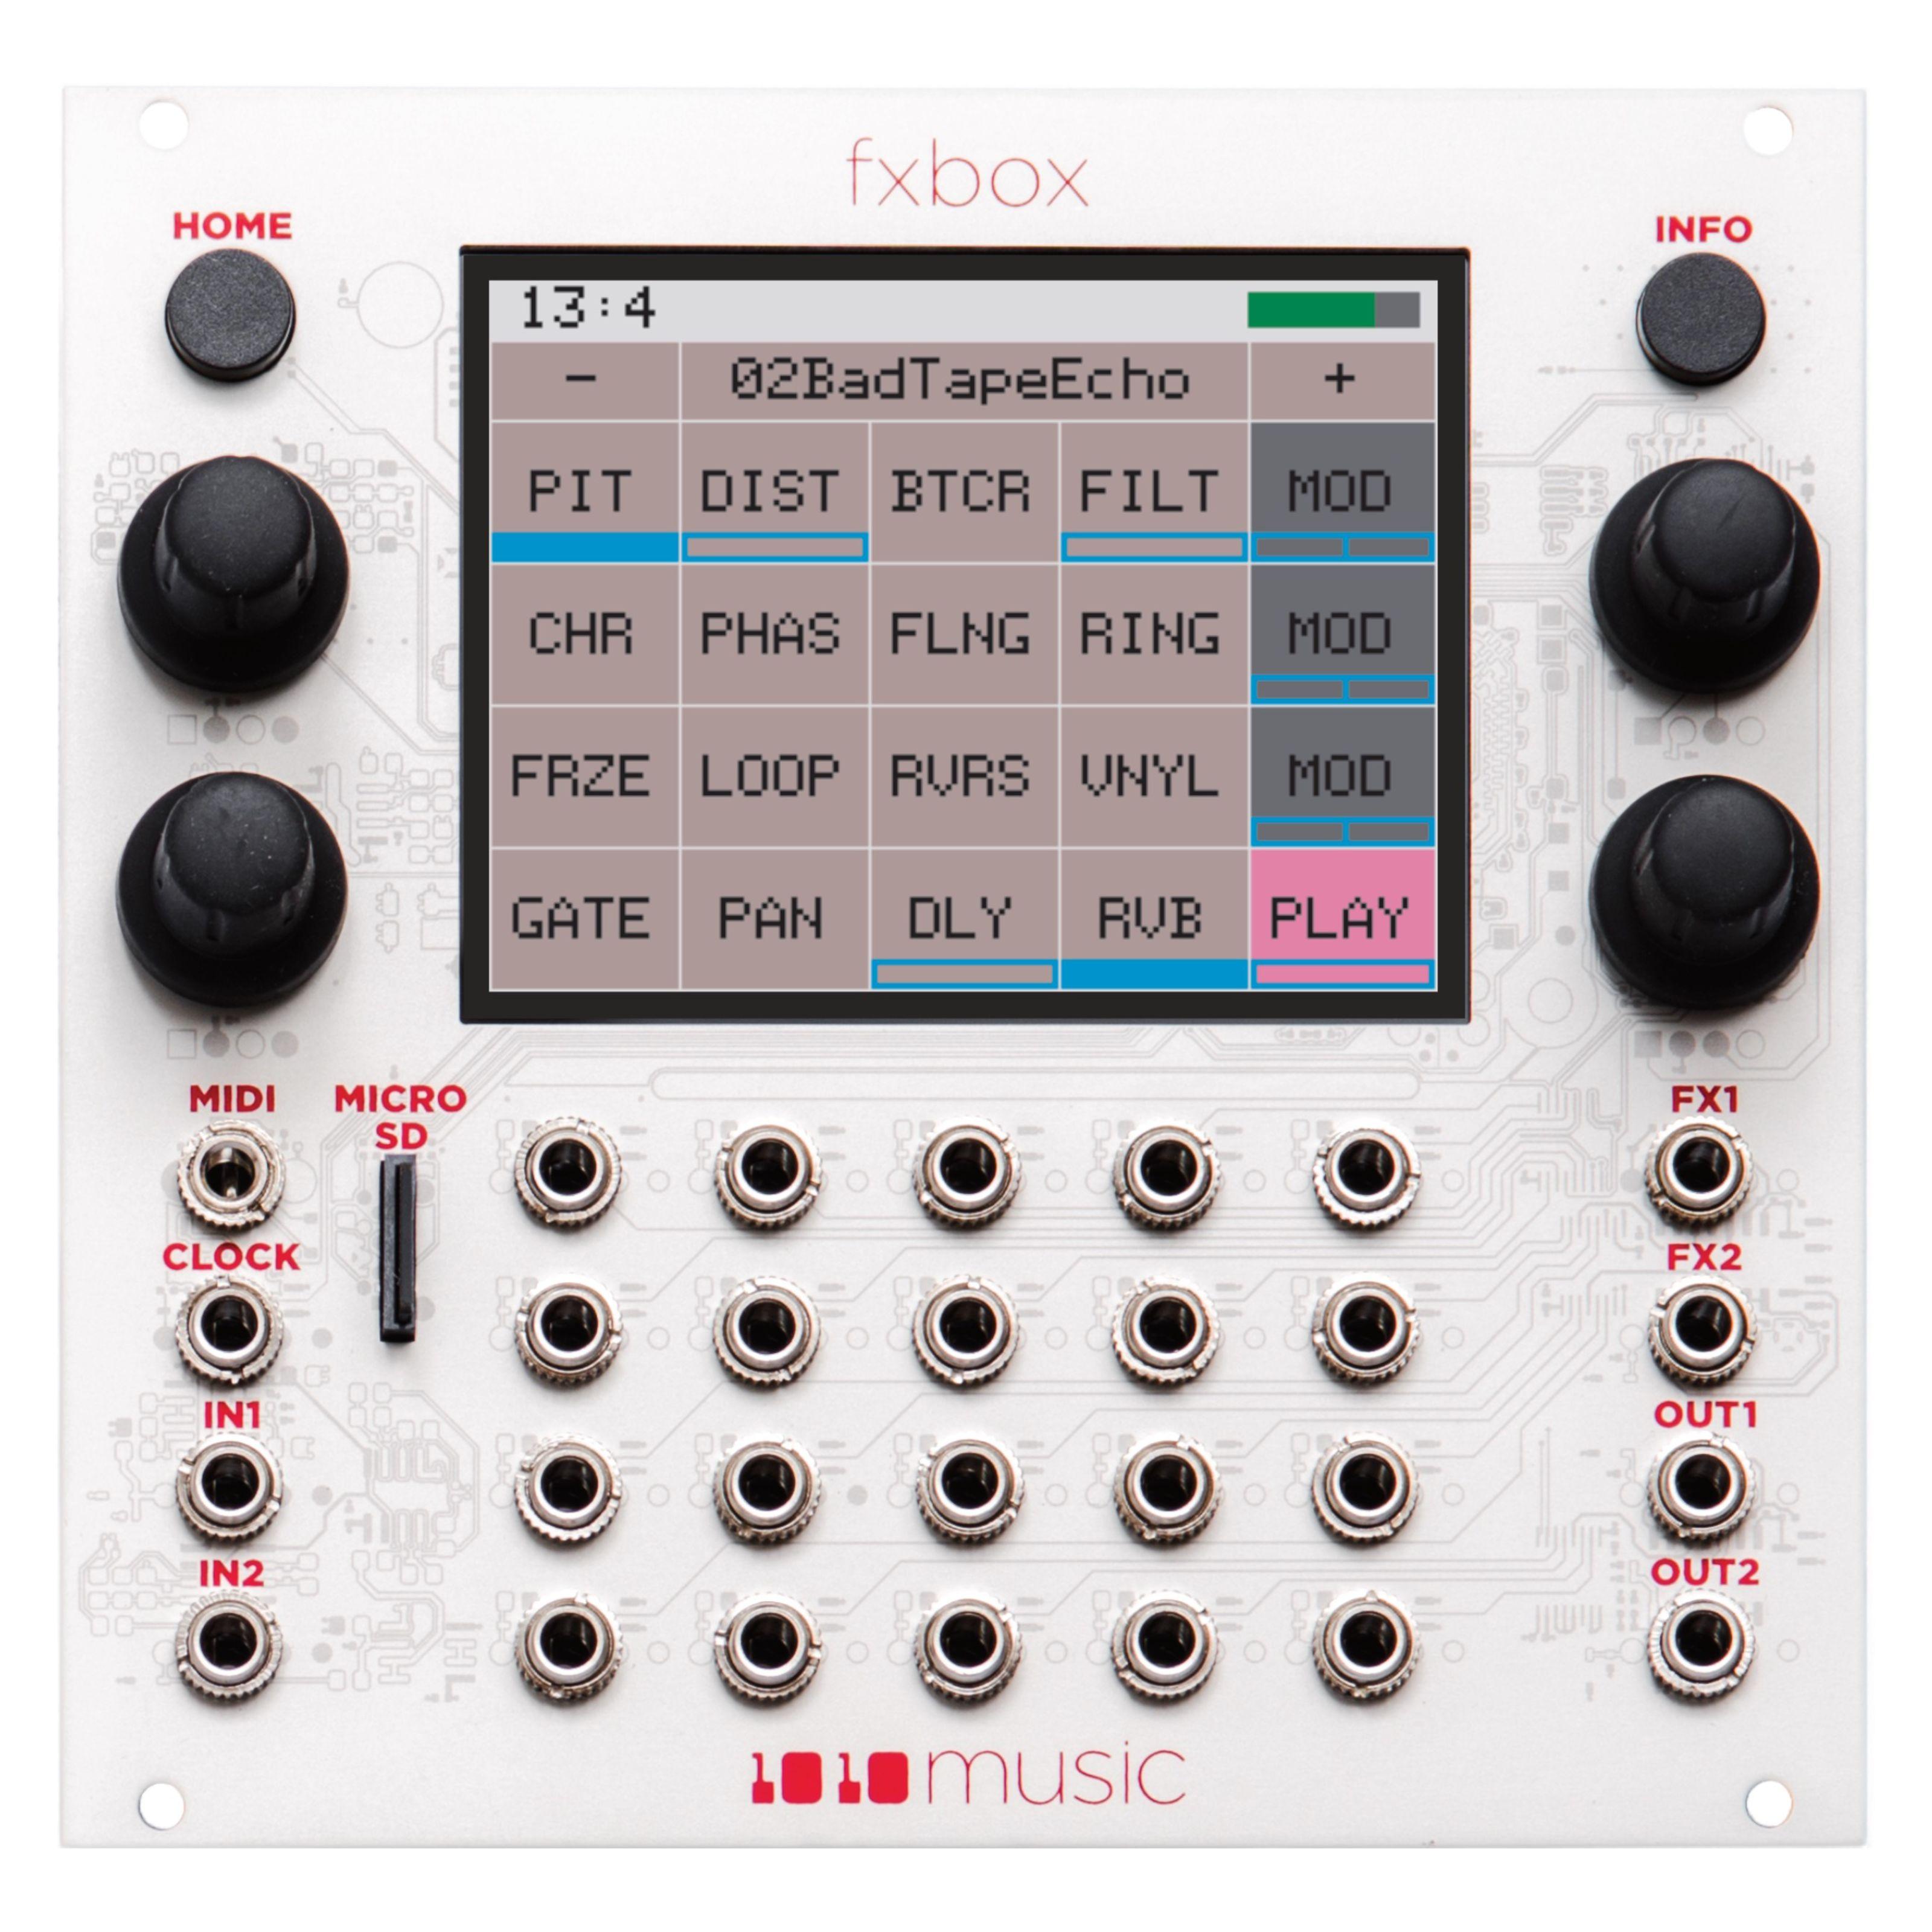 1010 Music - Fxbox